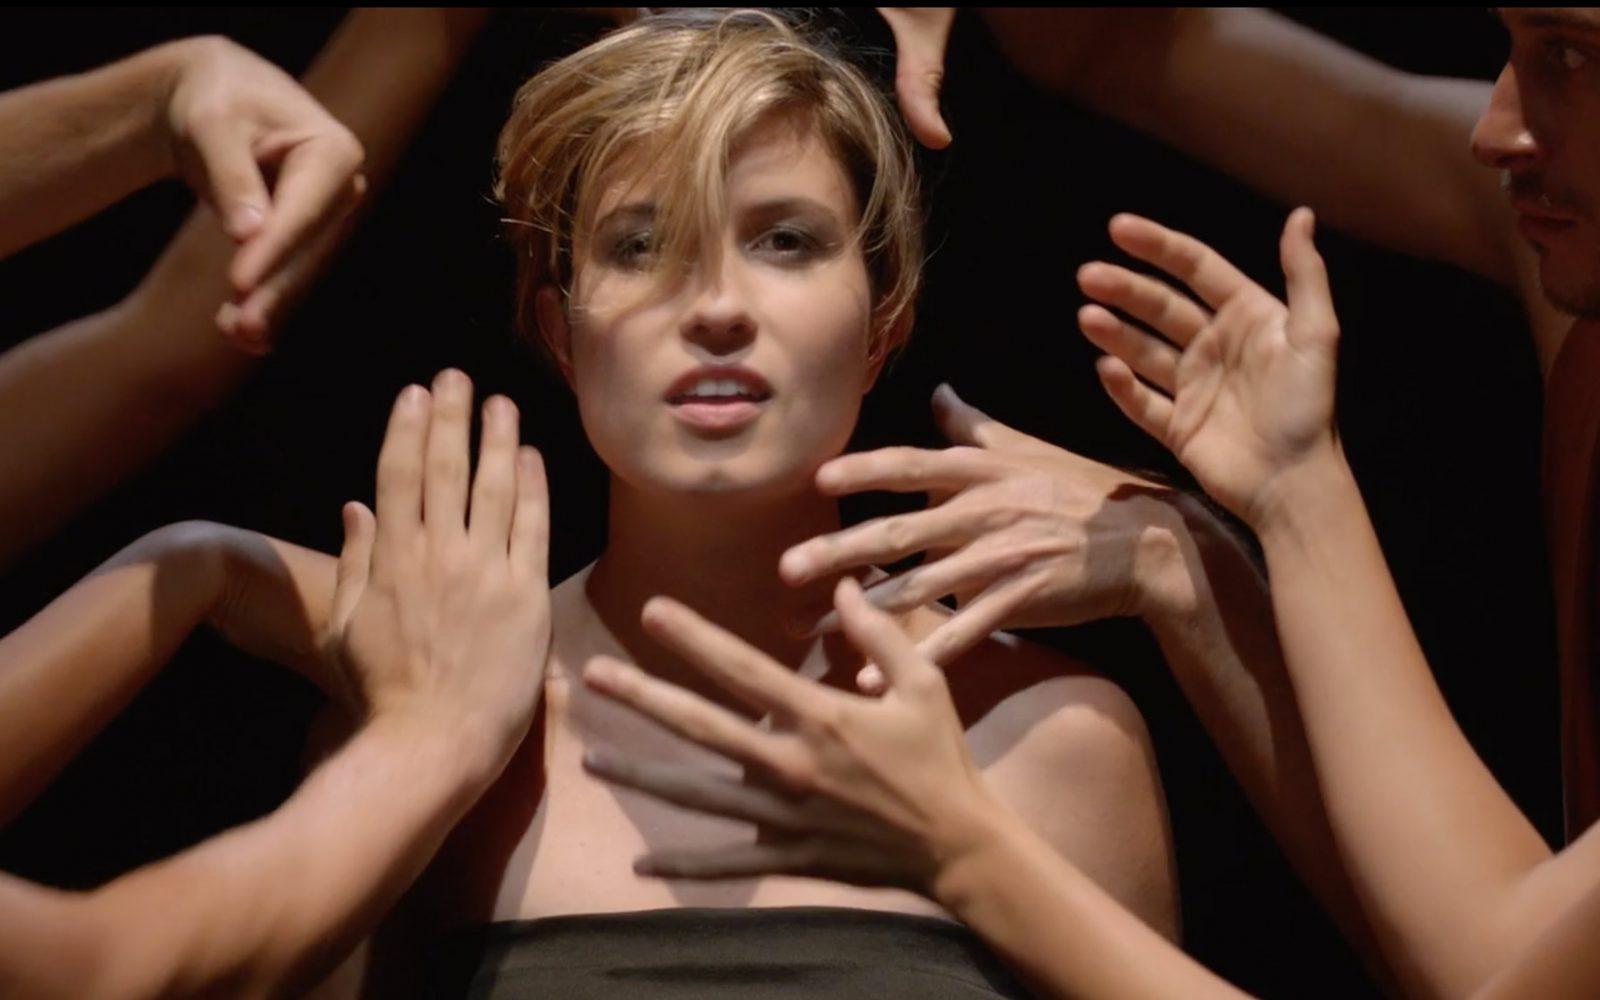 MUSICVID_Missy-Higgins-'Unashamed-Desire'_08